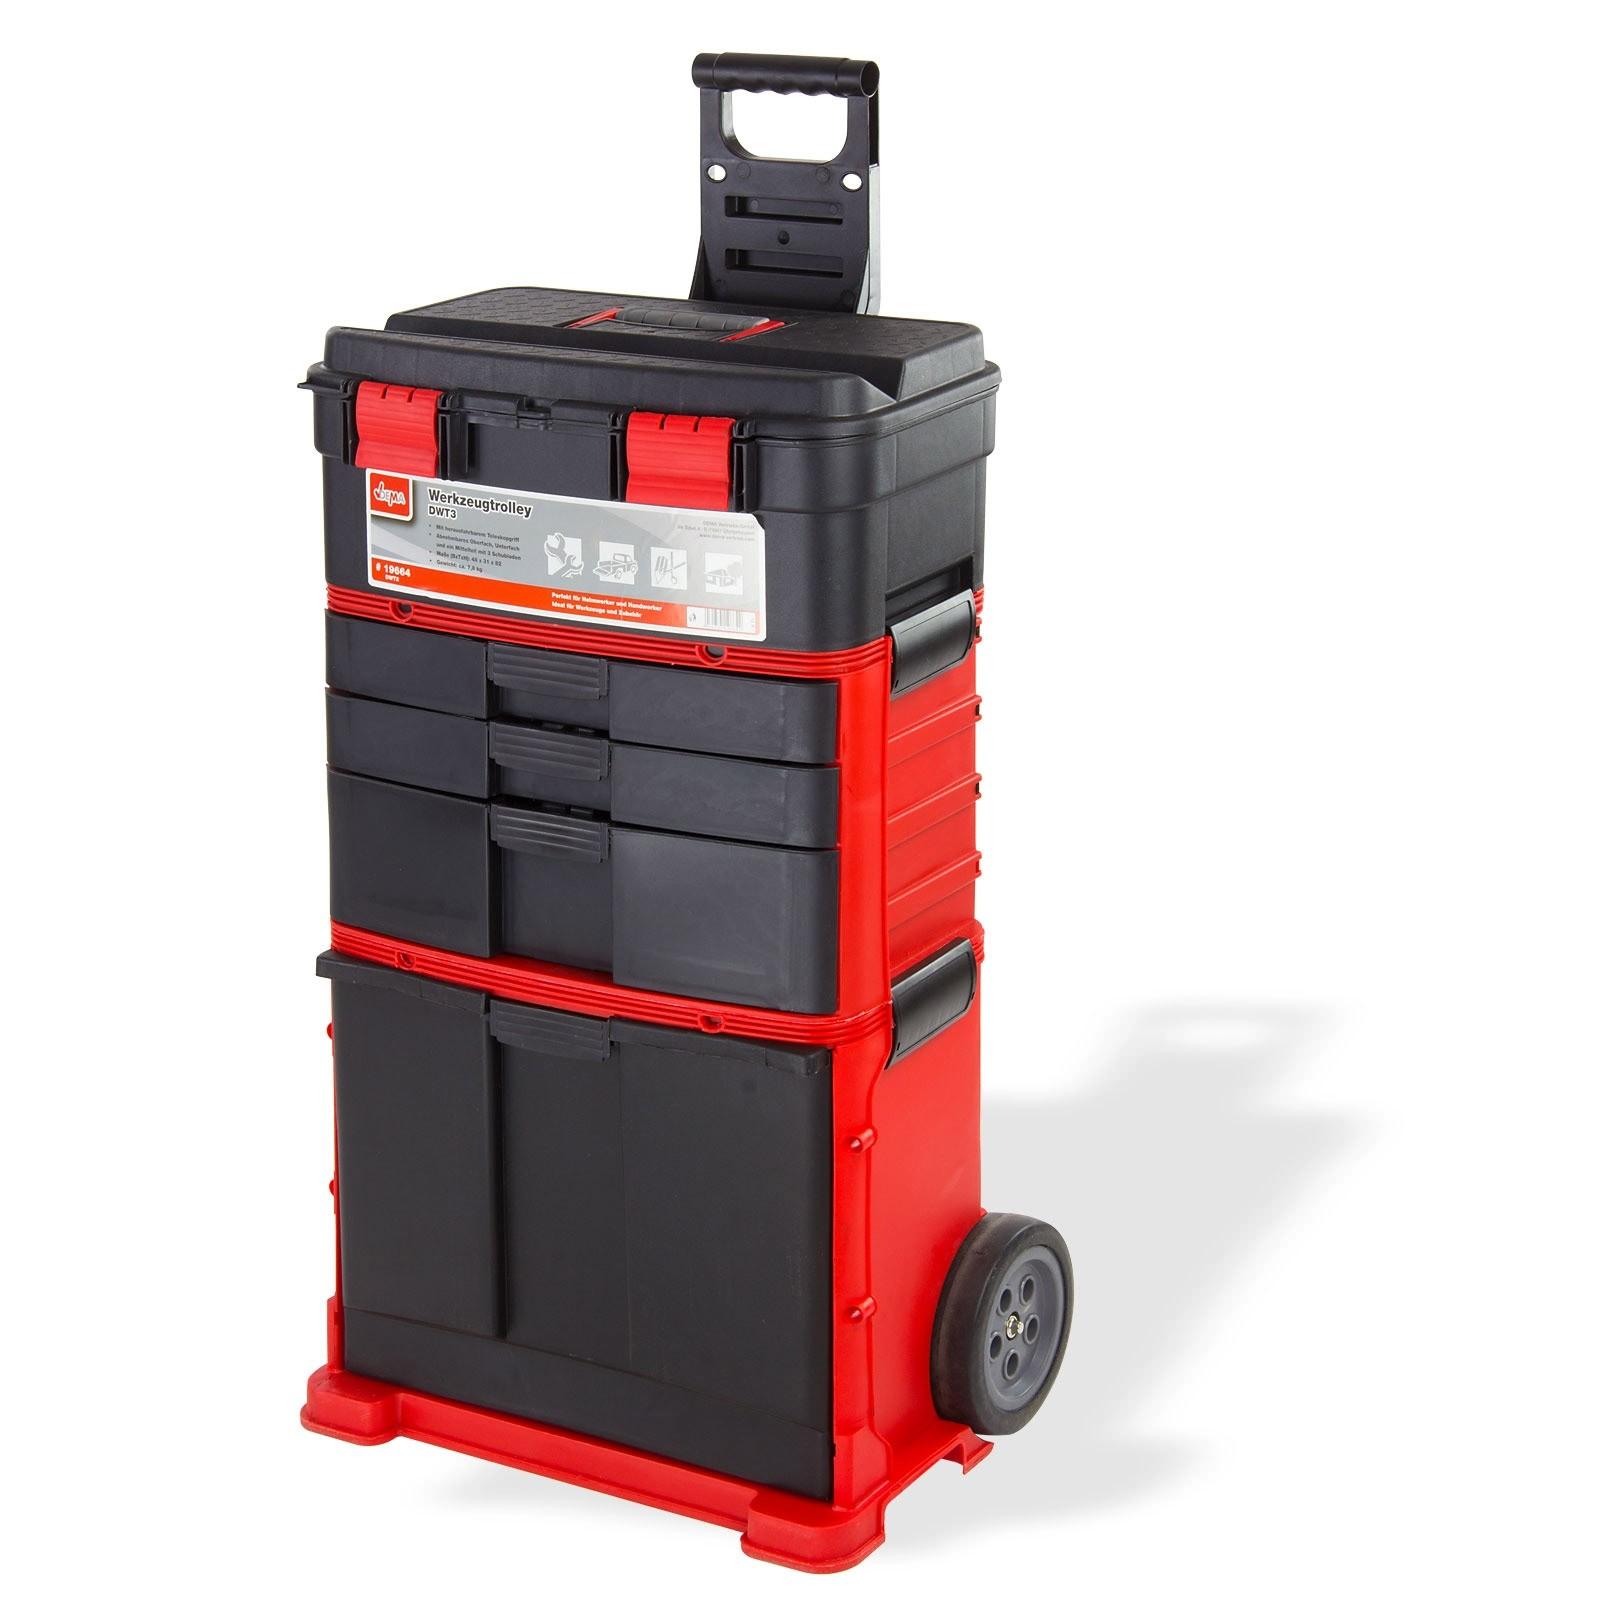 werkzeugkoffer werkzeugtrolley dwt3 3 koffer. Black Bedroom Furniture Sets. Home Design Ideas